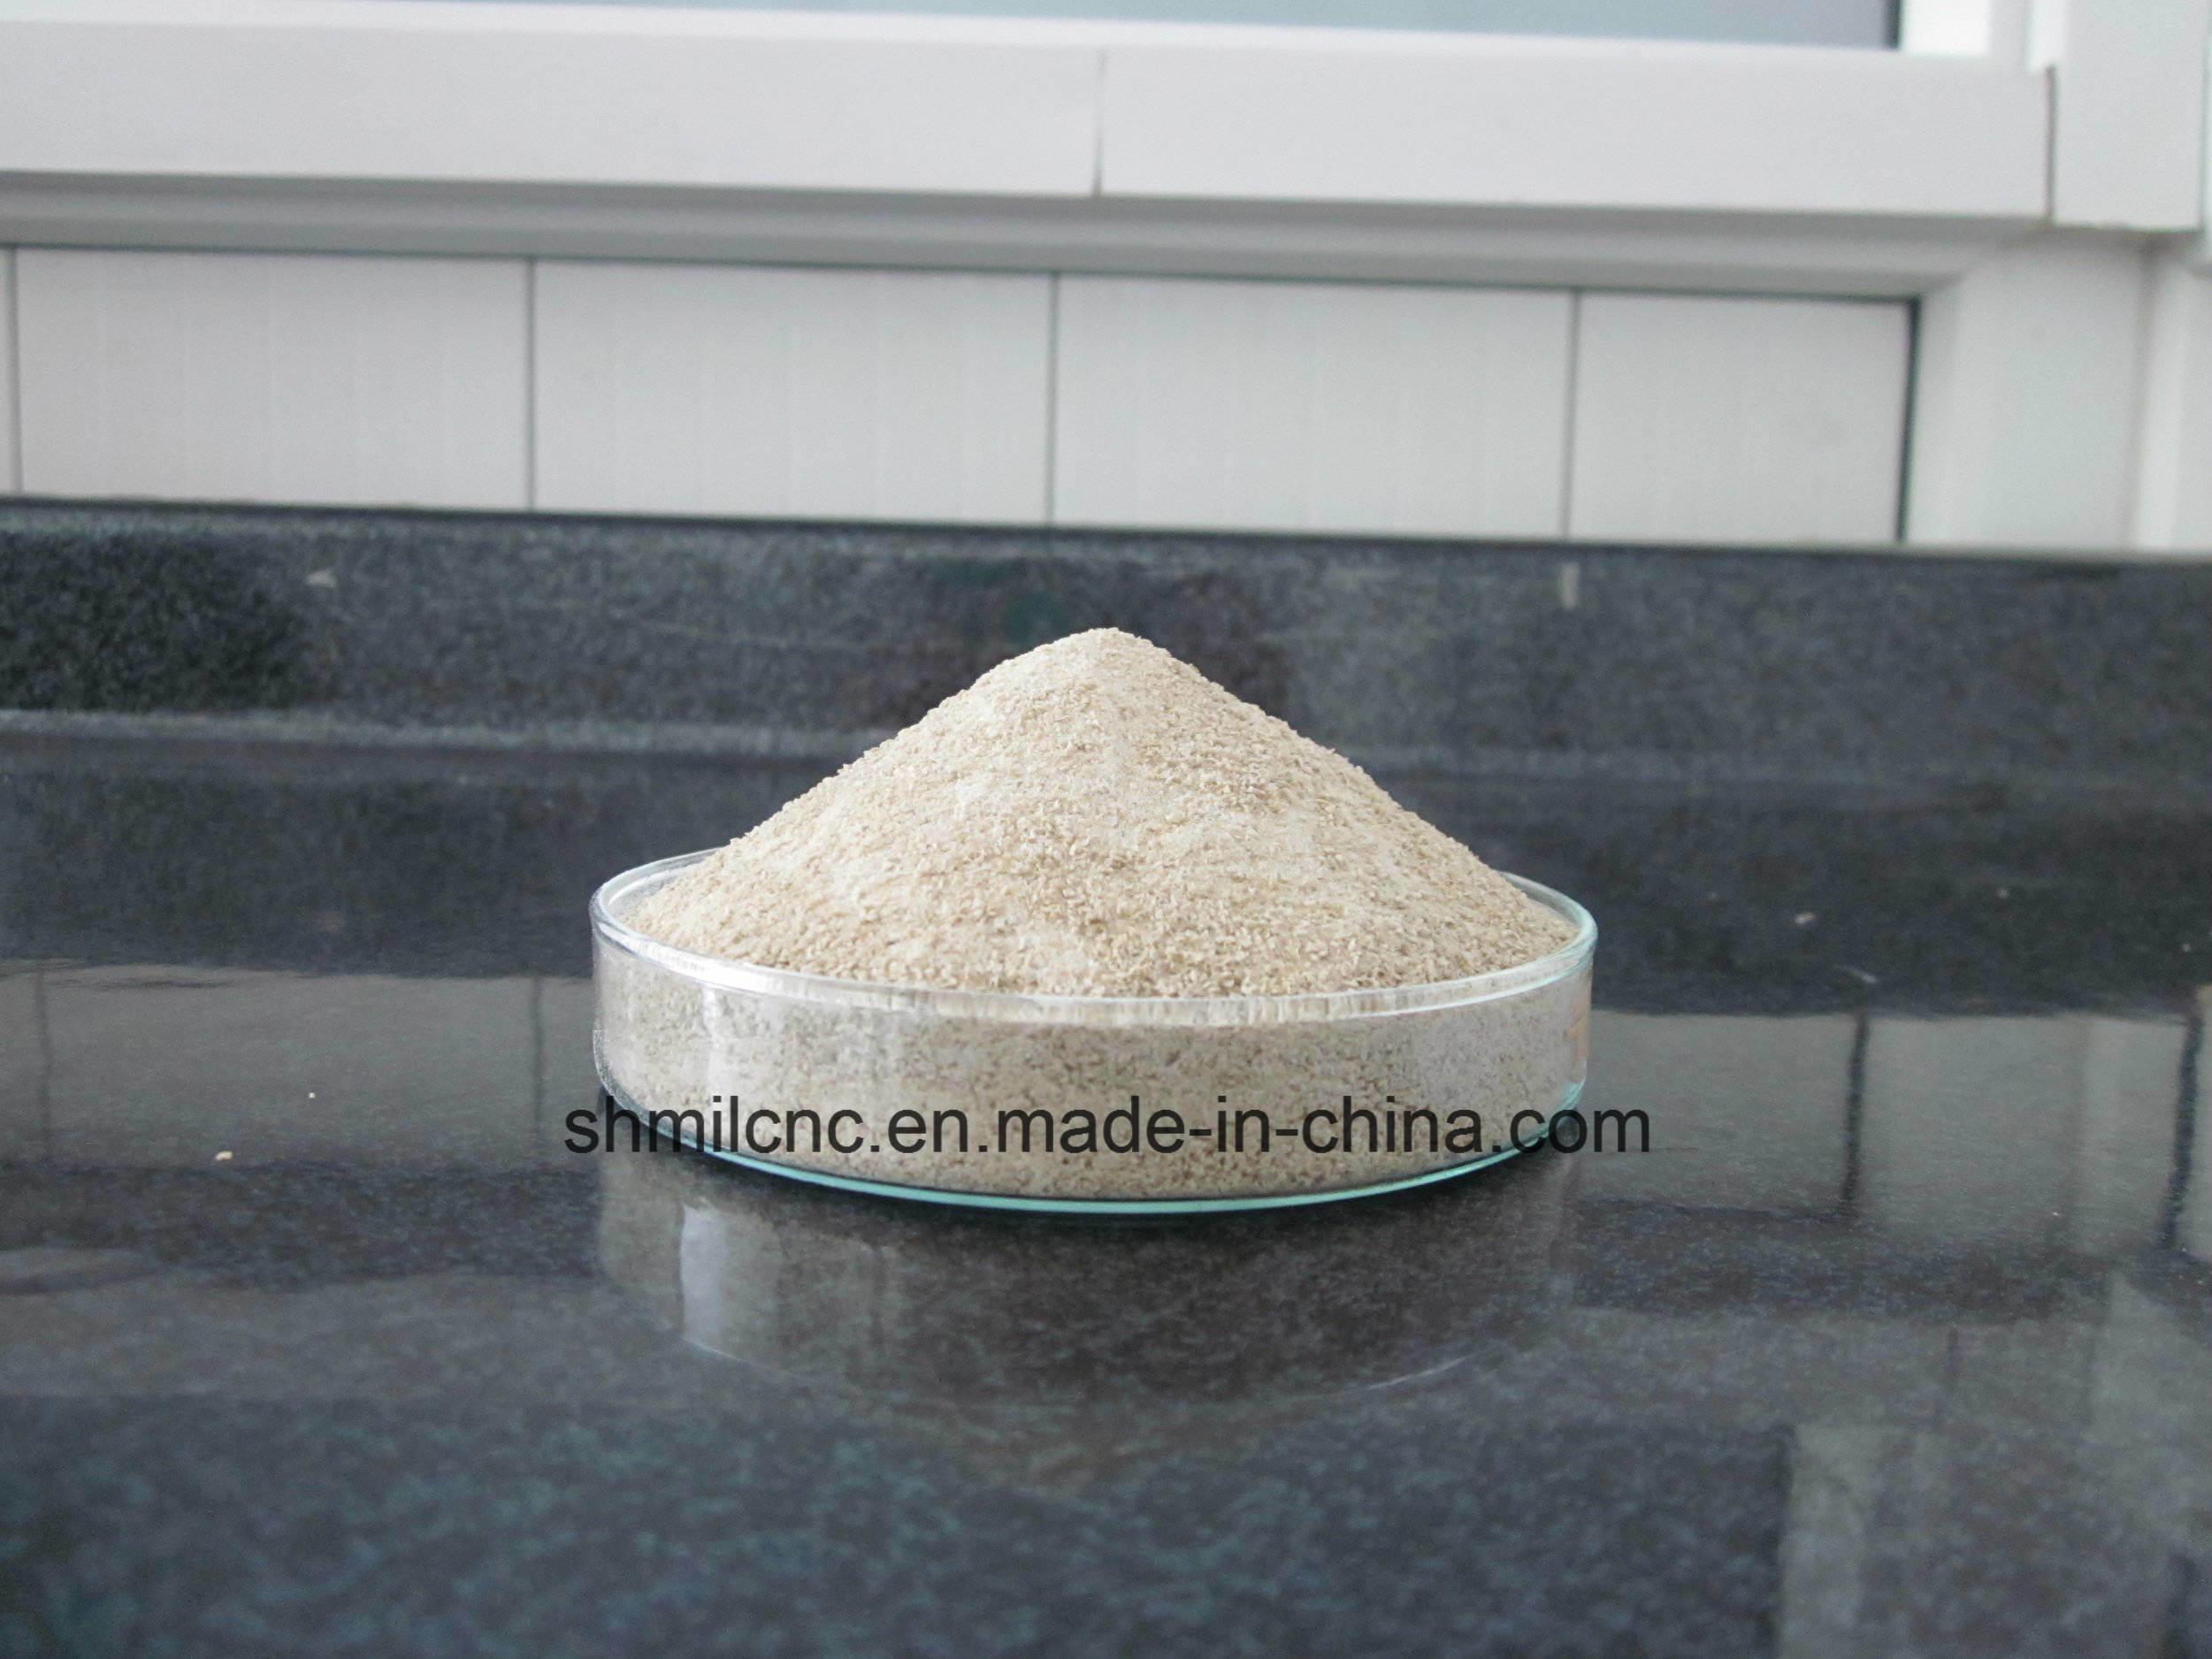 Sodium Alginate Textile Grade, Printing Thickener, Printing Algin